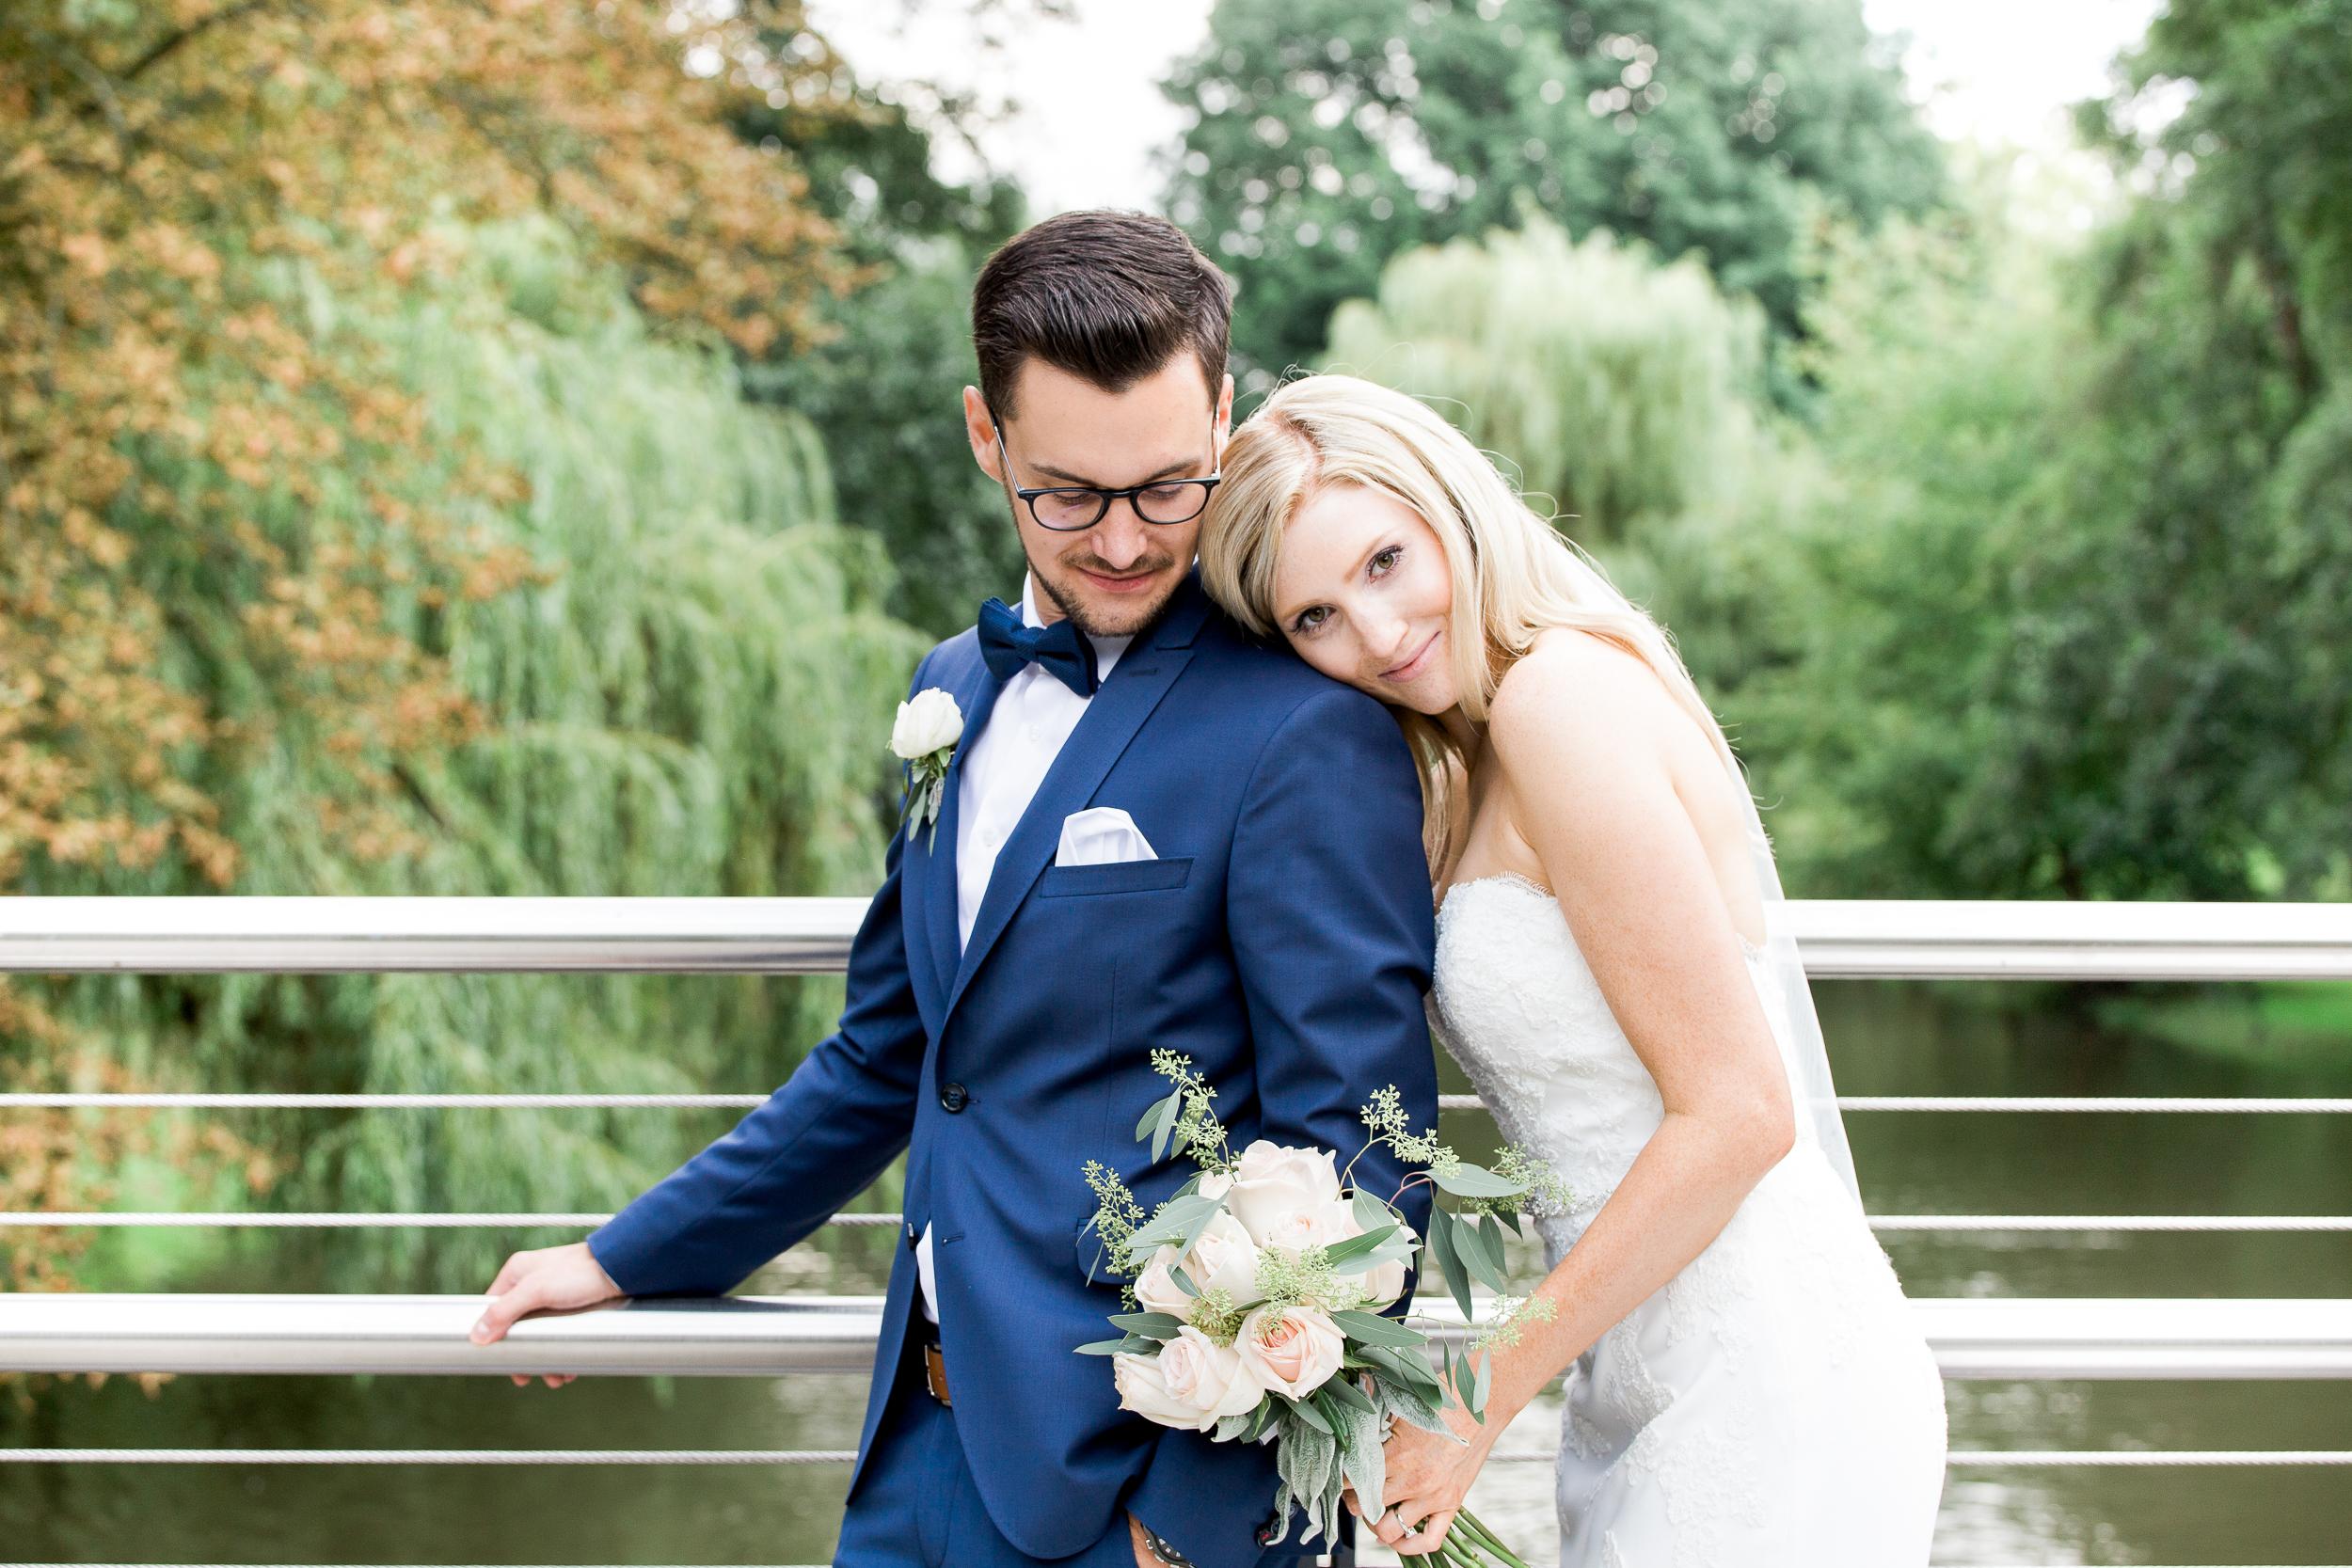 Miss I Do Wedding Photography Hochzeitsfotografin Hannover